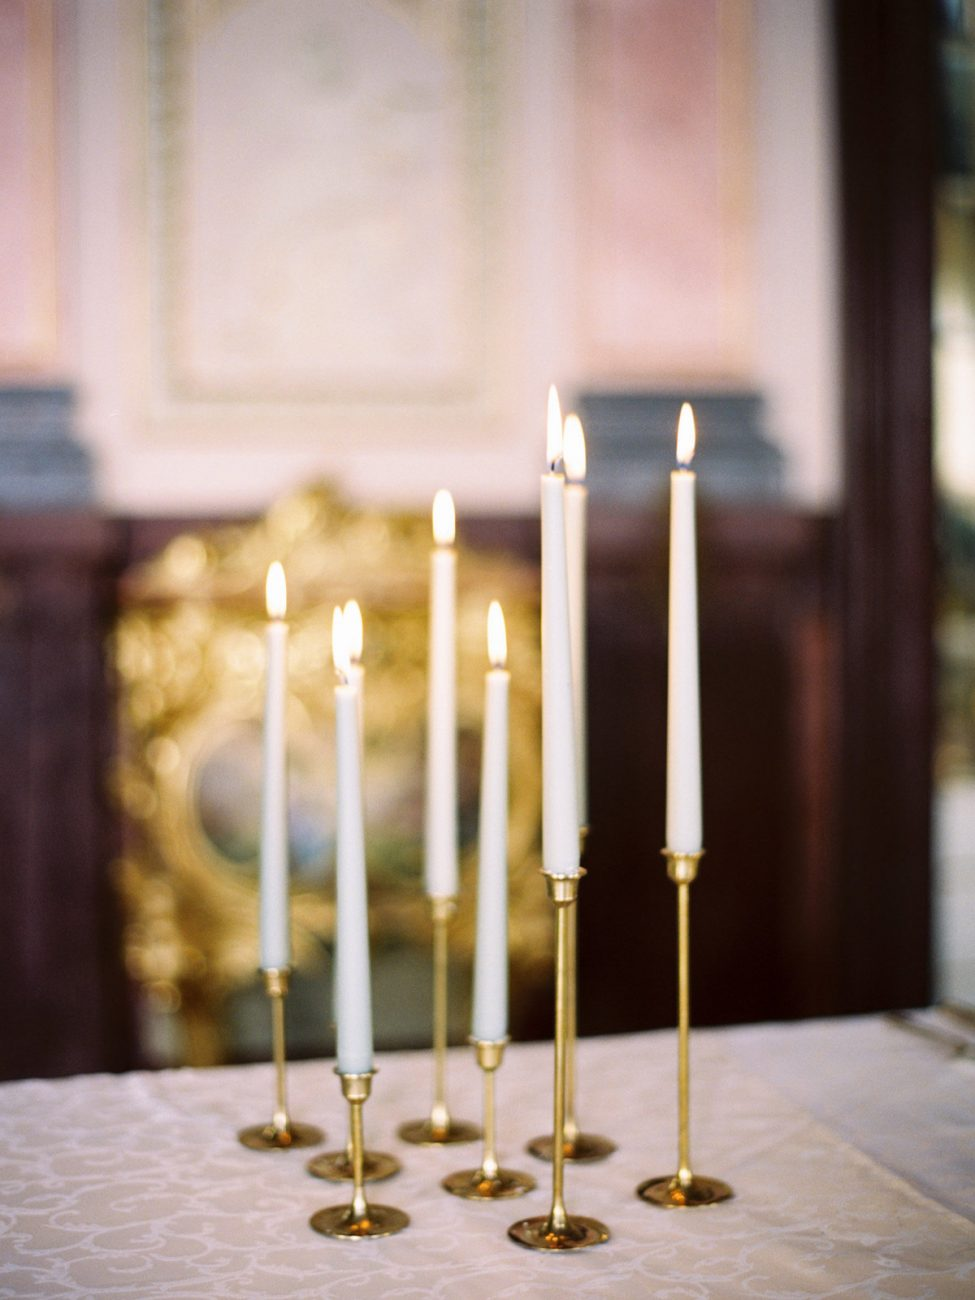 Palace Wedding Inspiration - candles